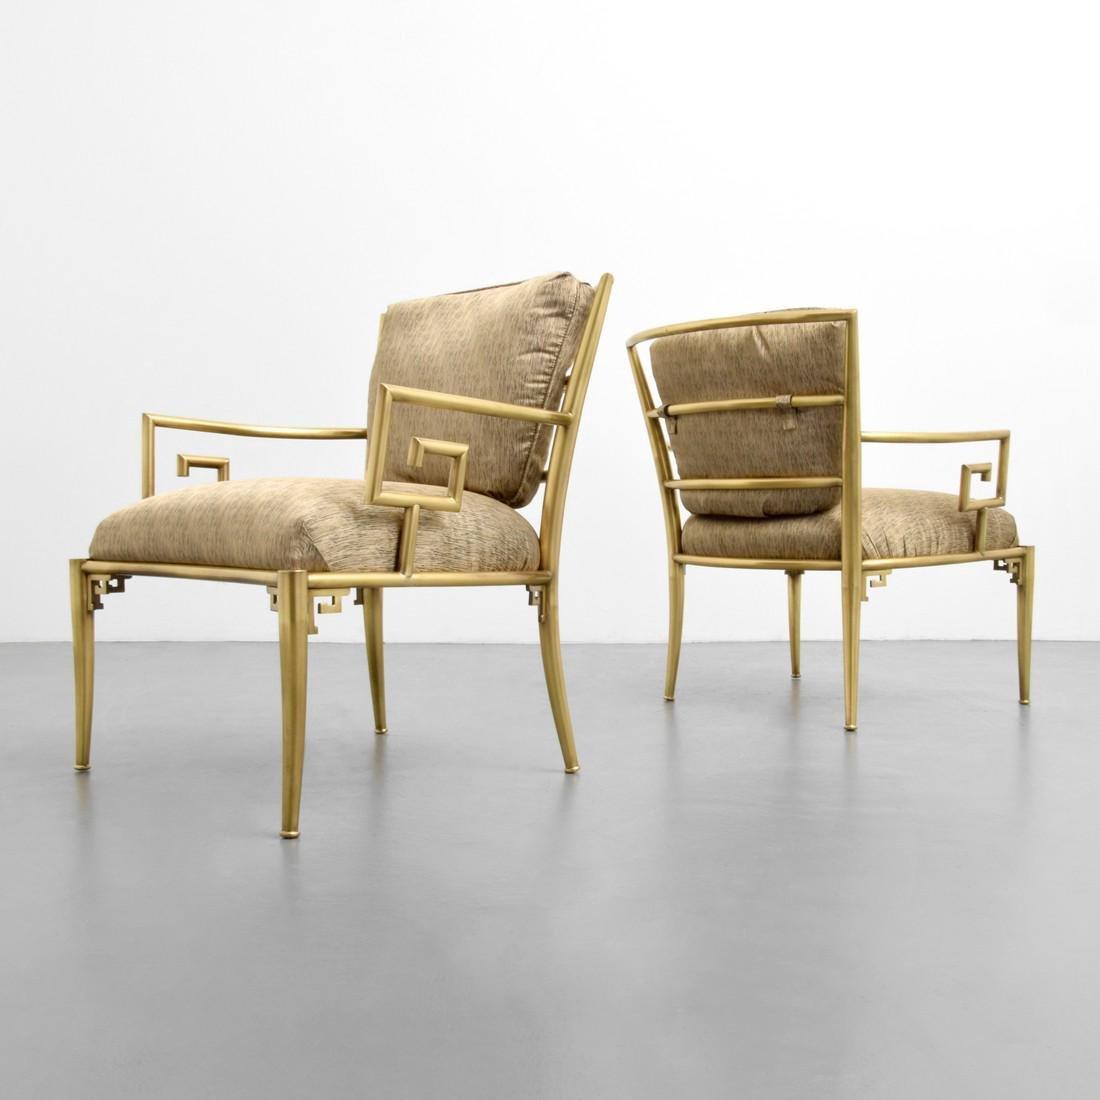 Greek Key Lounge Chairs, Attributed to Mastercraft